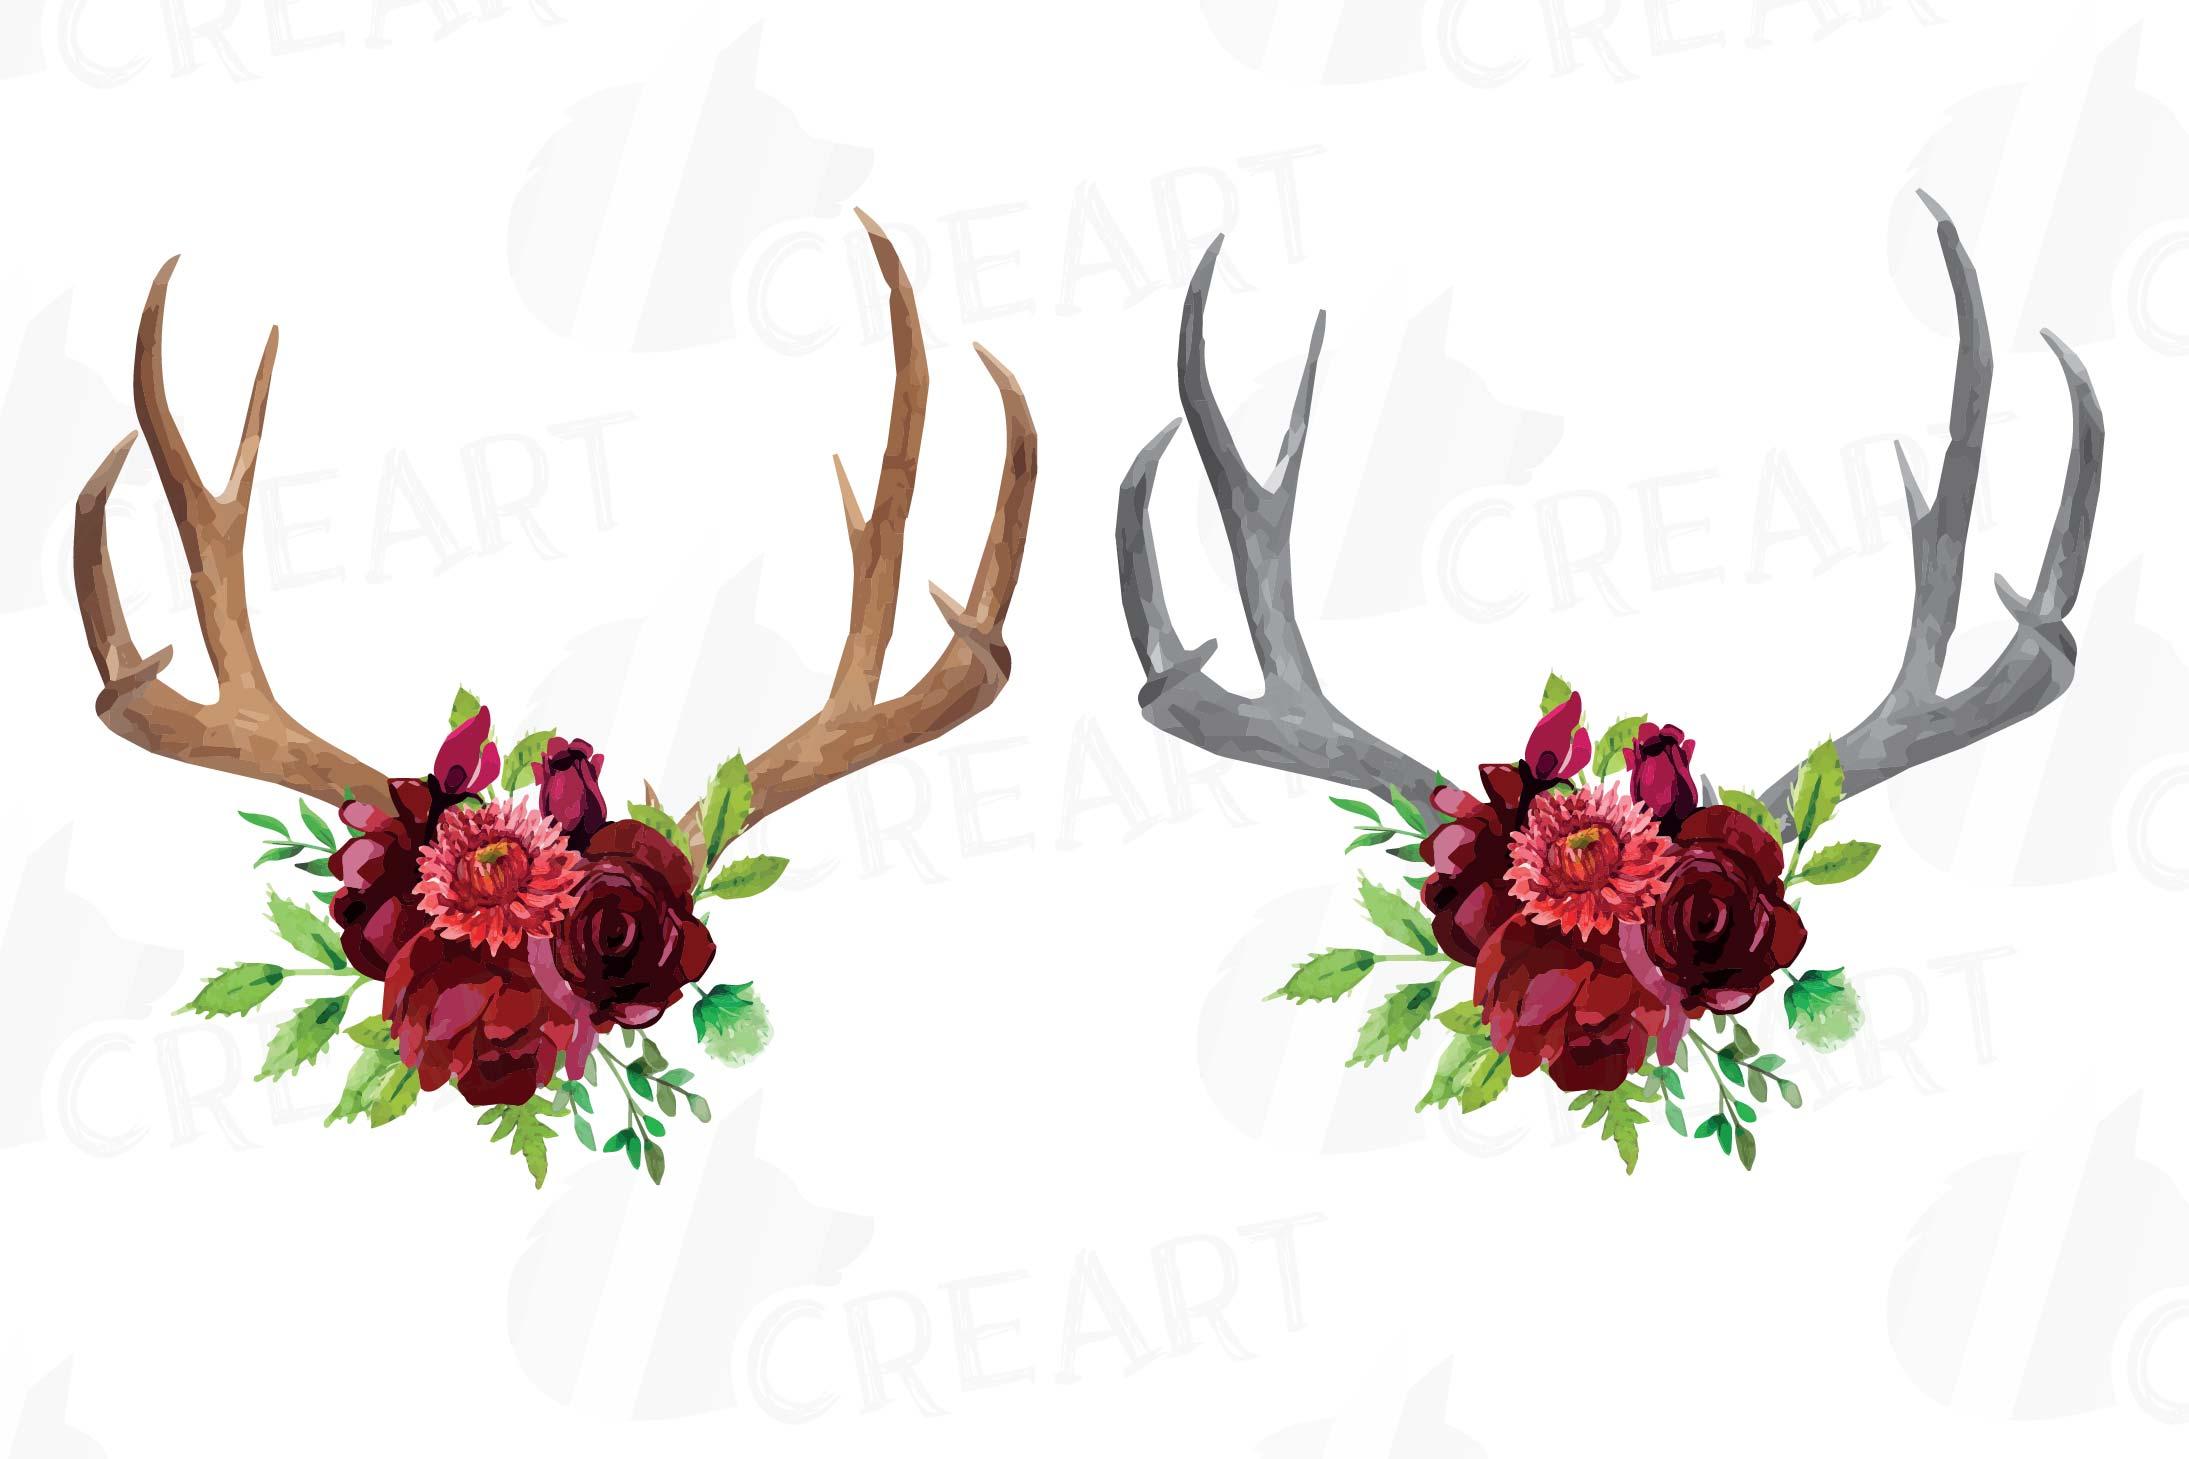 Watercolor Floral Deer horn clipart, Indian Tribal deer horn.